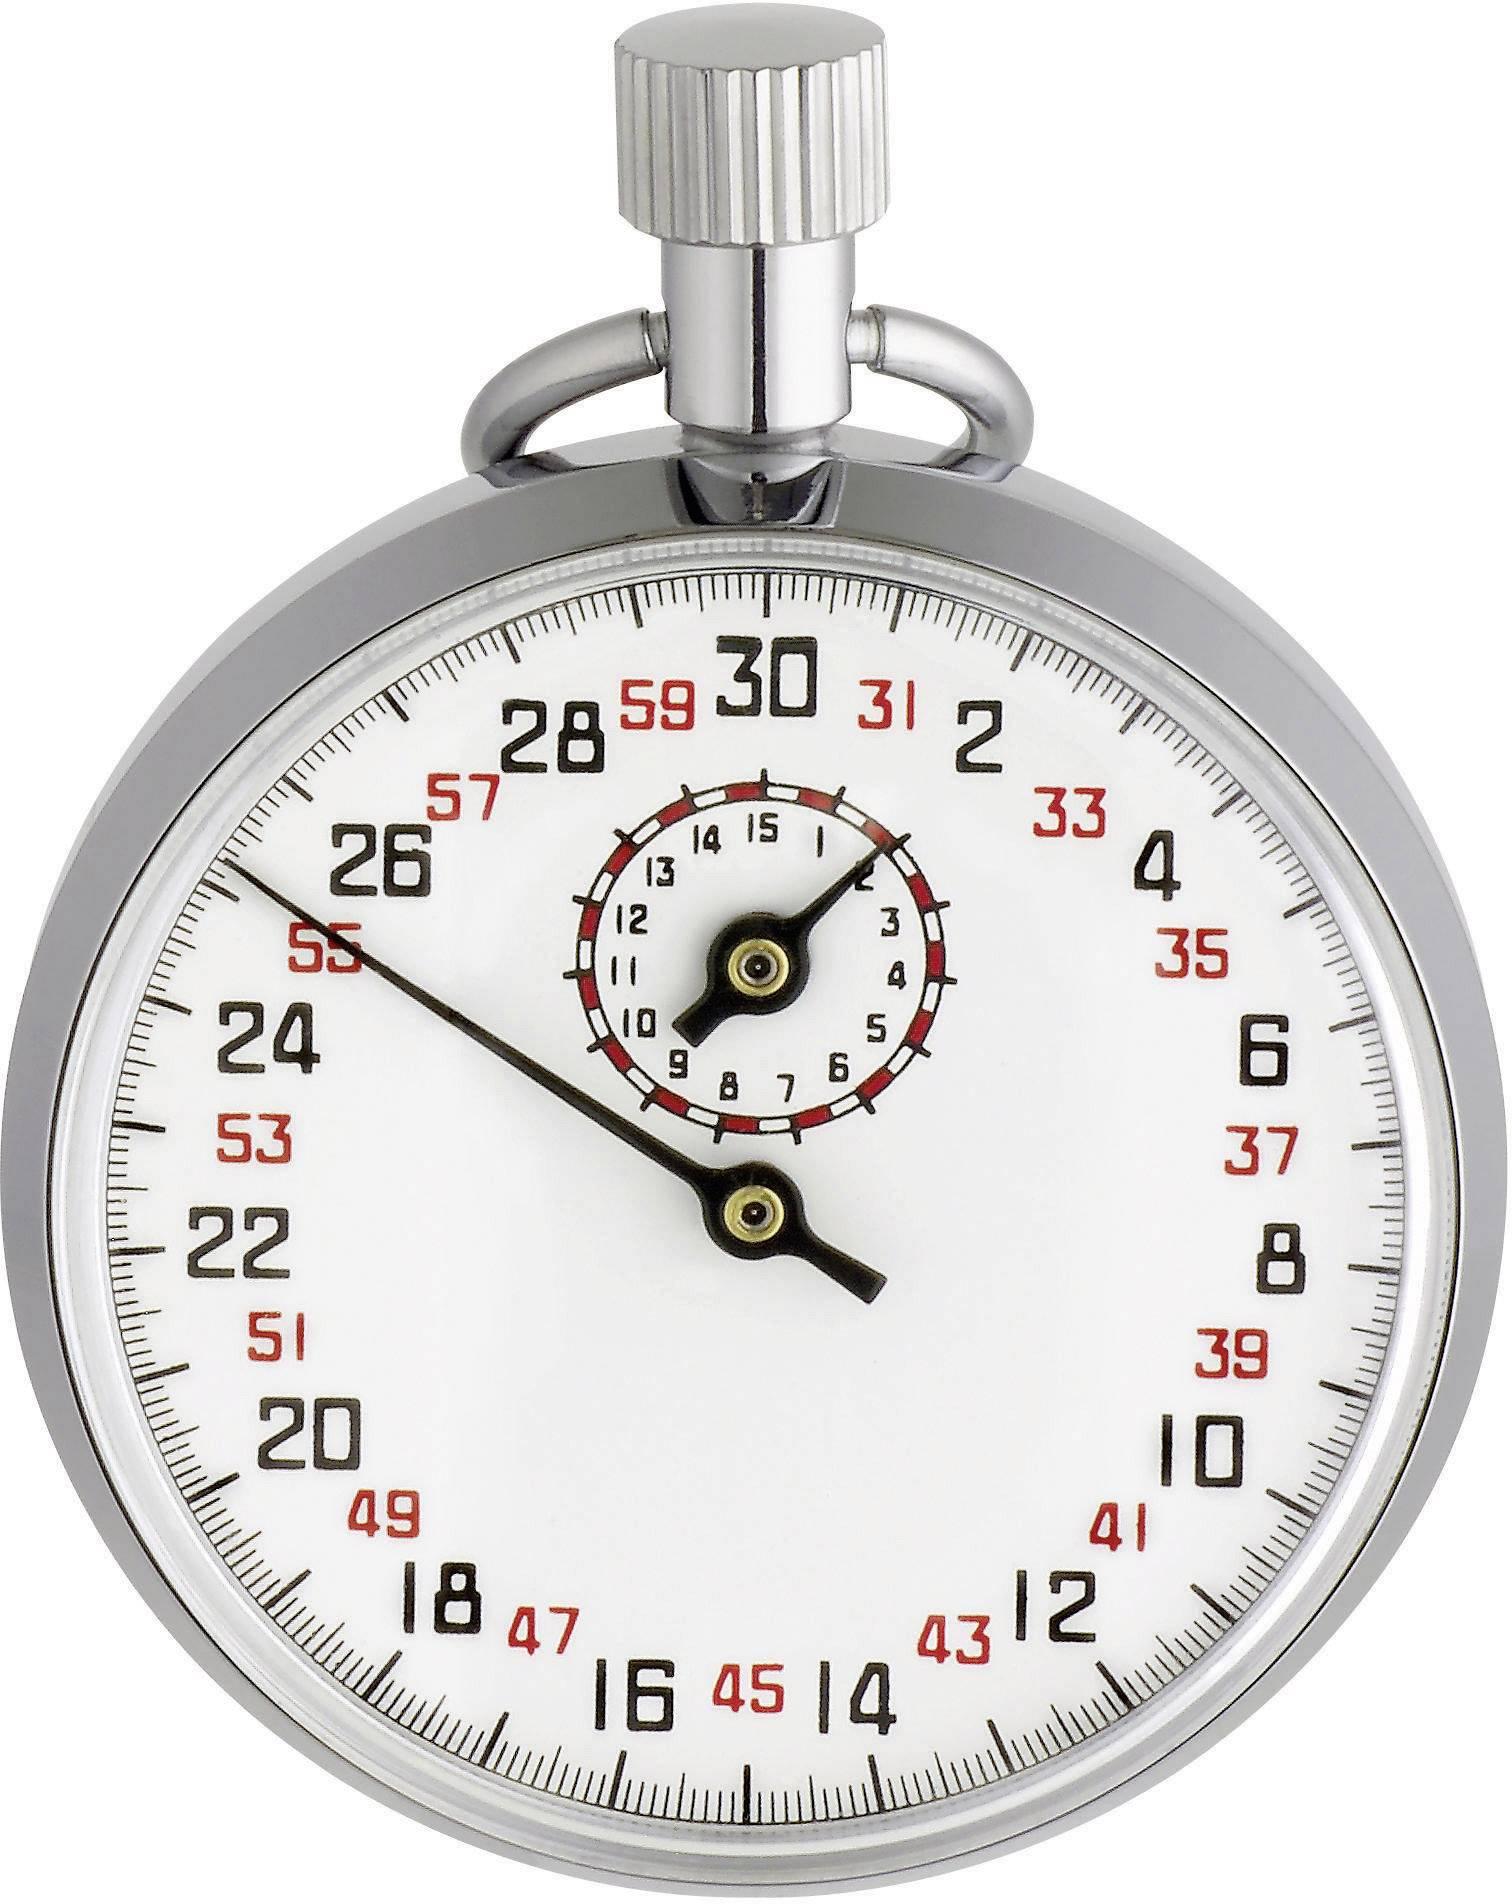 TFA 38 1021 Analogue stopwatch Silver   Conrad com